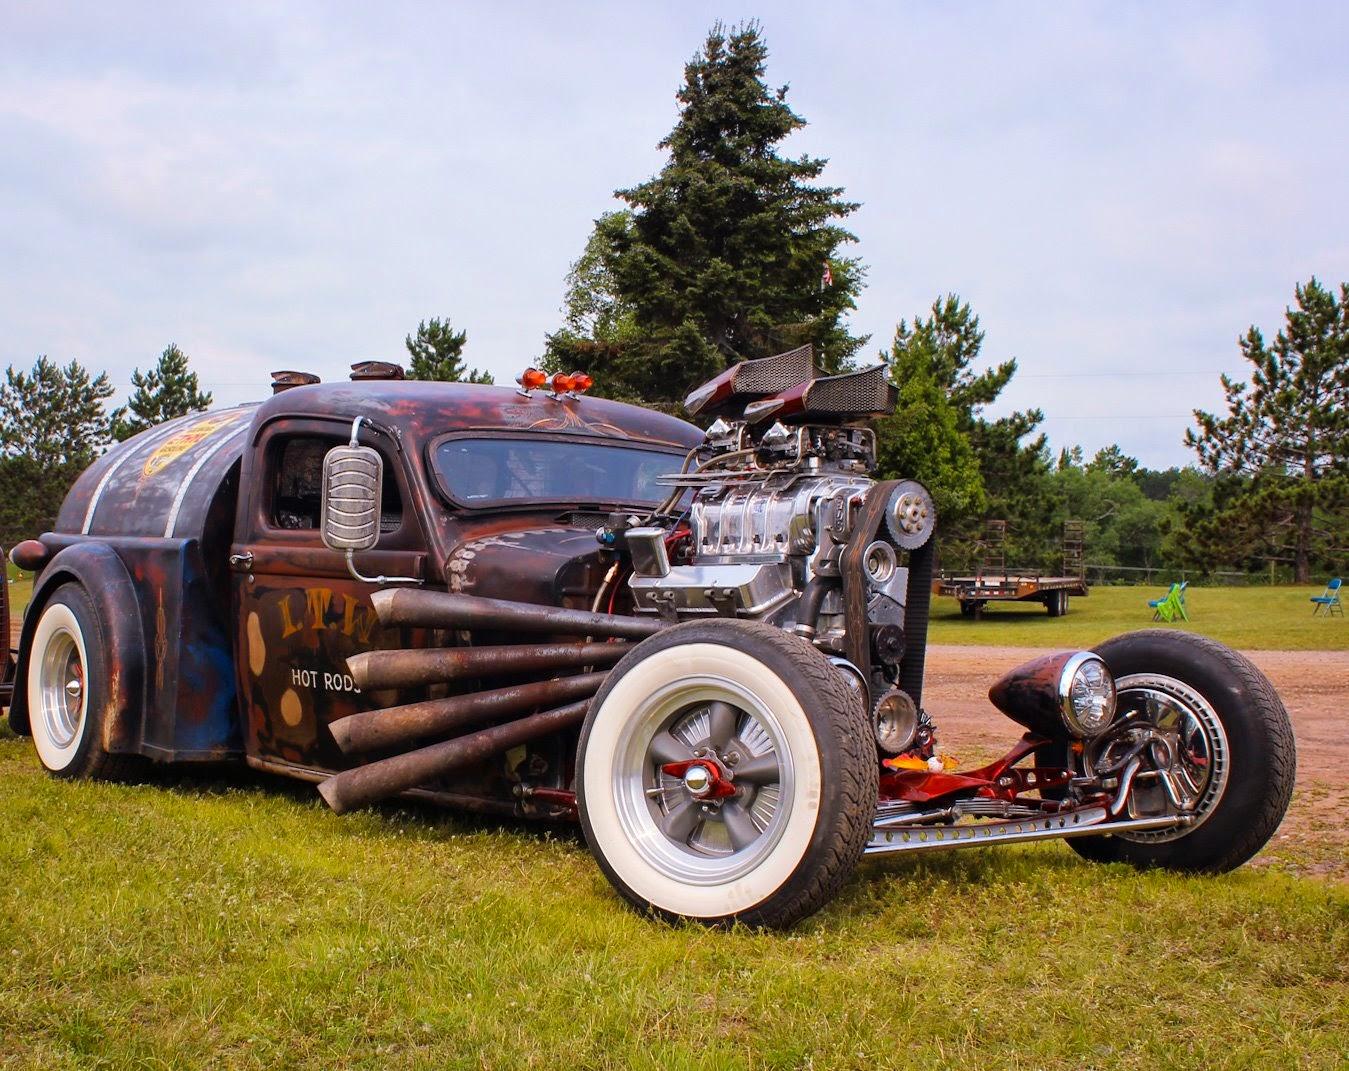 rat rod cars best - photo #26